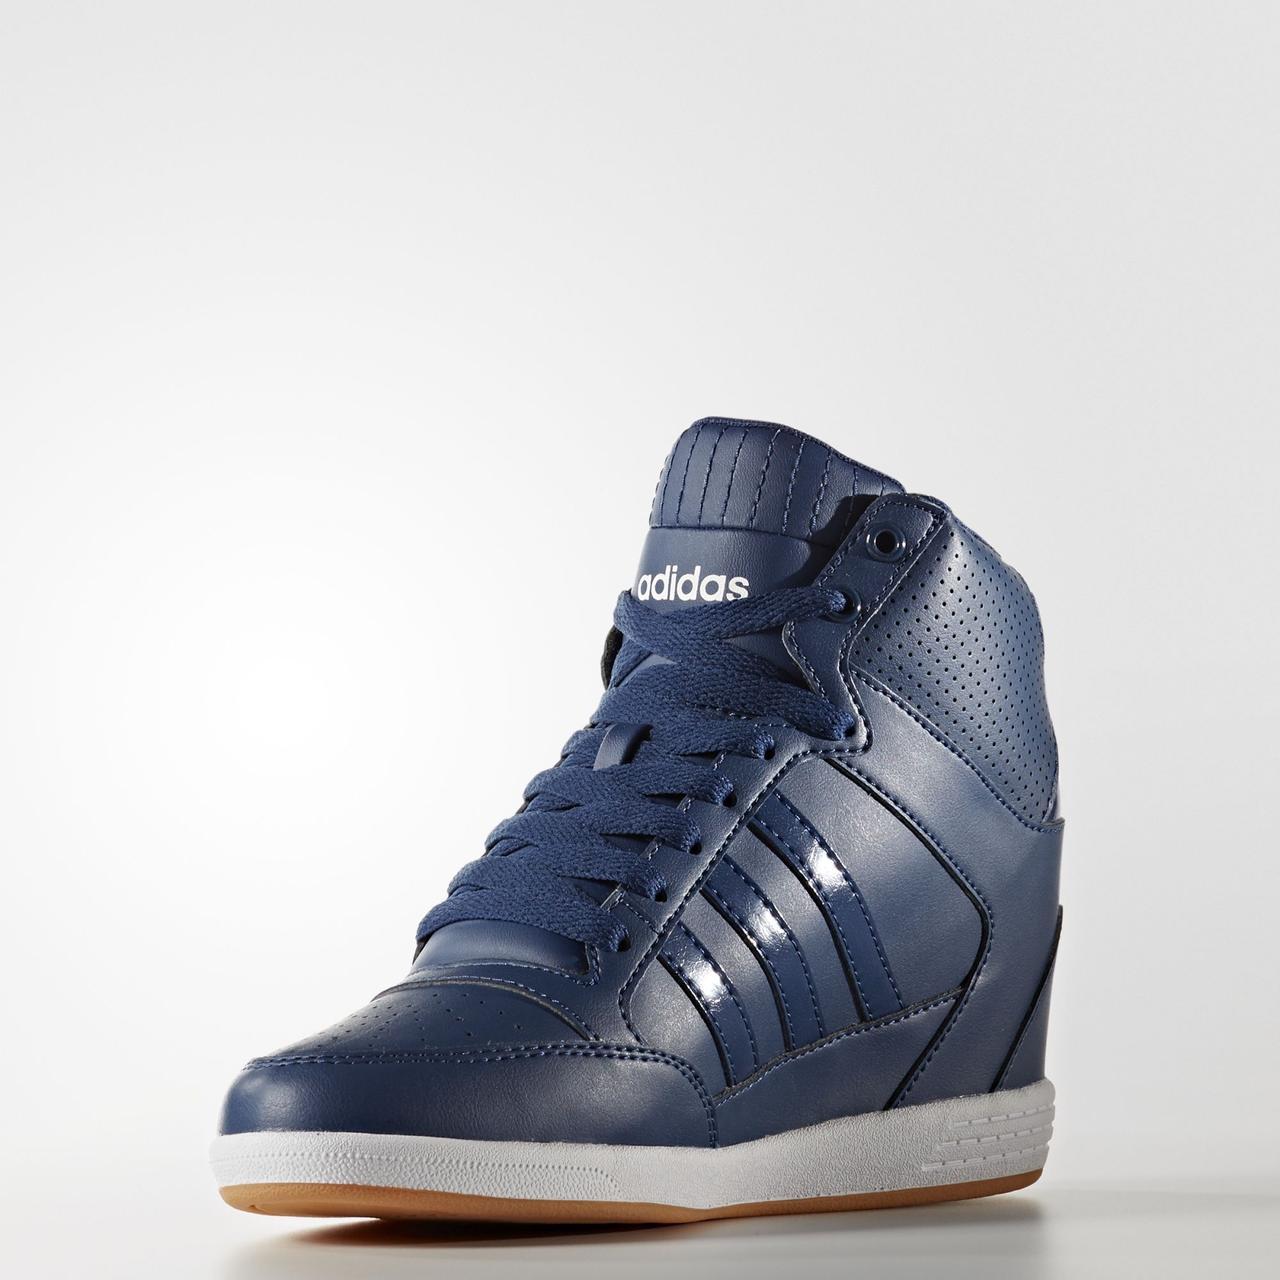 cbdc7758da81 Женские кроссовки Adidas Neo Super Wedge (Артикул  AW3969) - Адидас  официальный интернет -